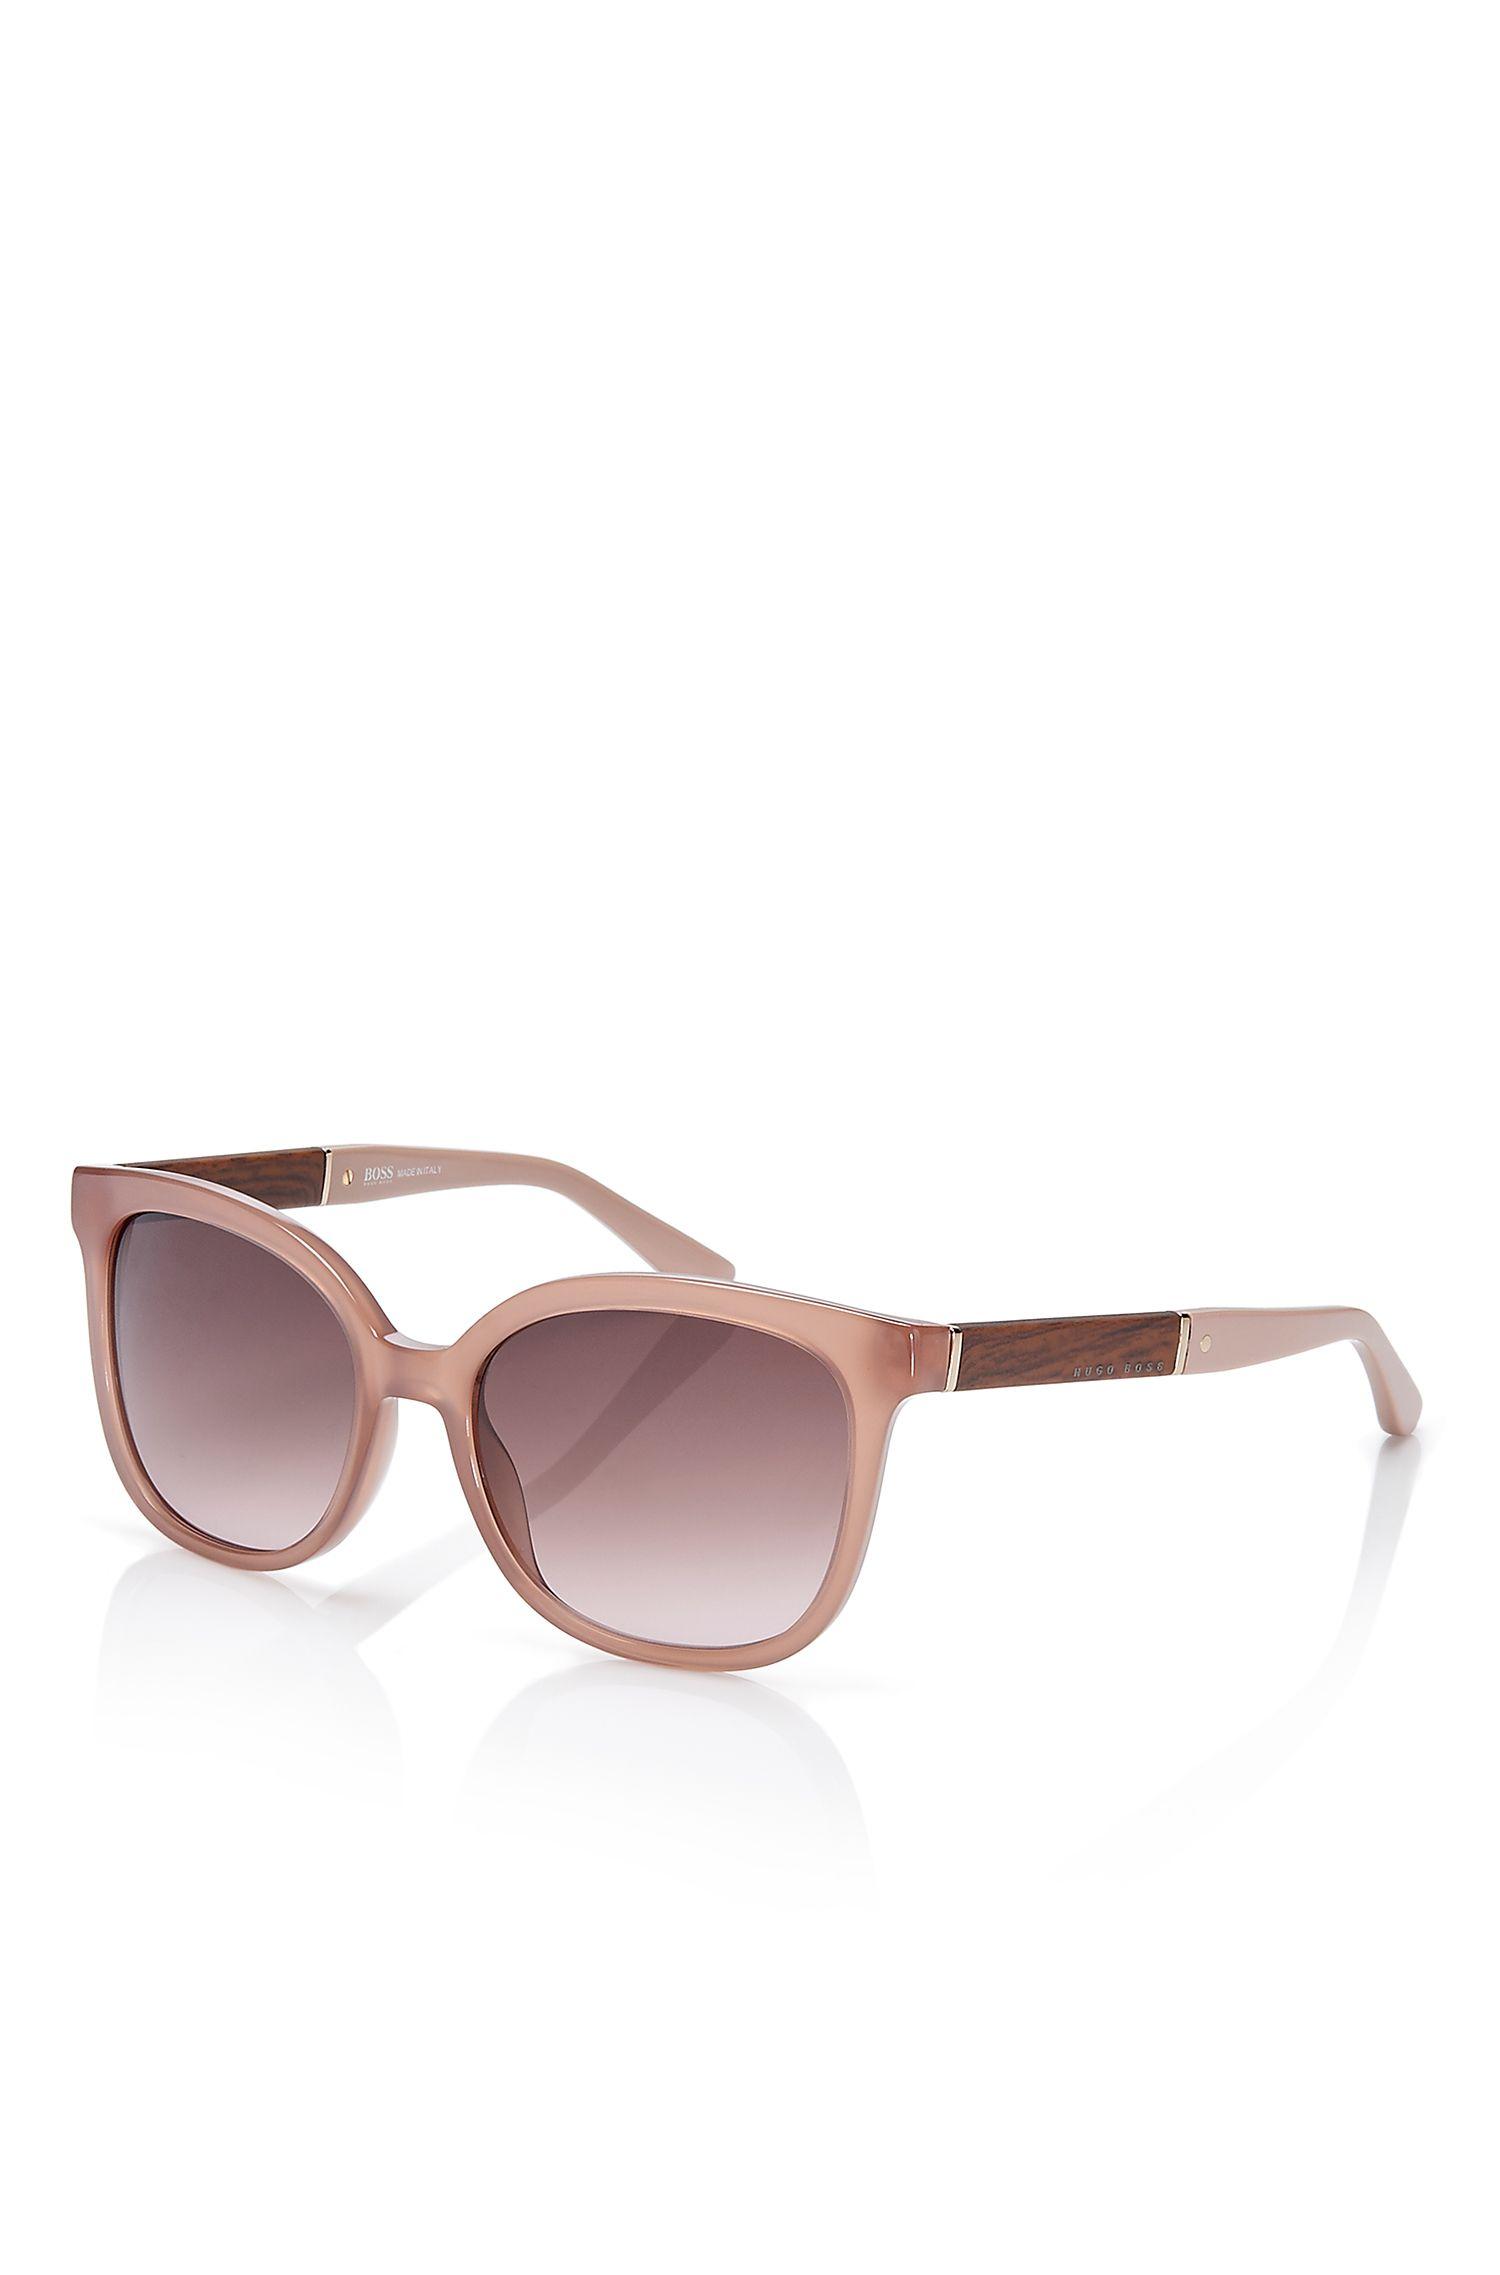 'BOSS 0663S' | Rectangular Wood Pattern Sunglasses